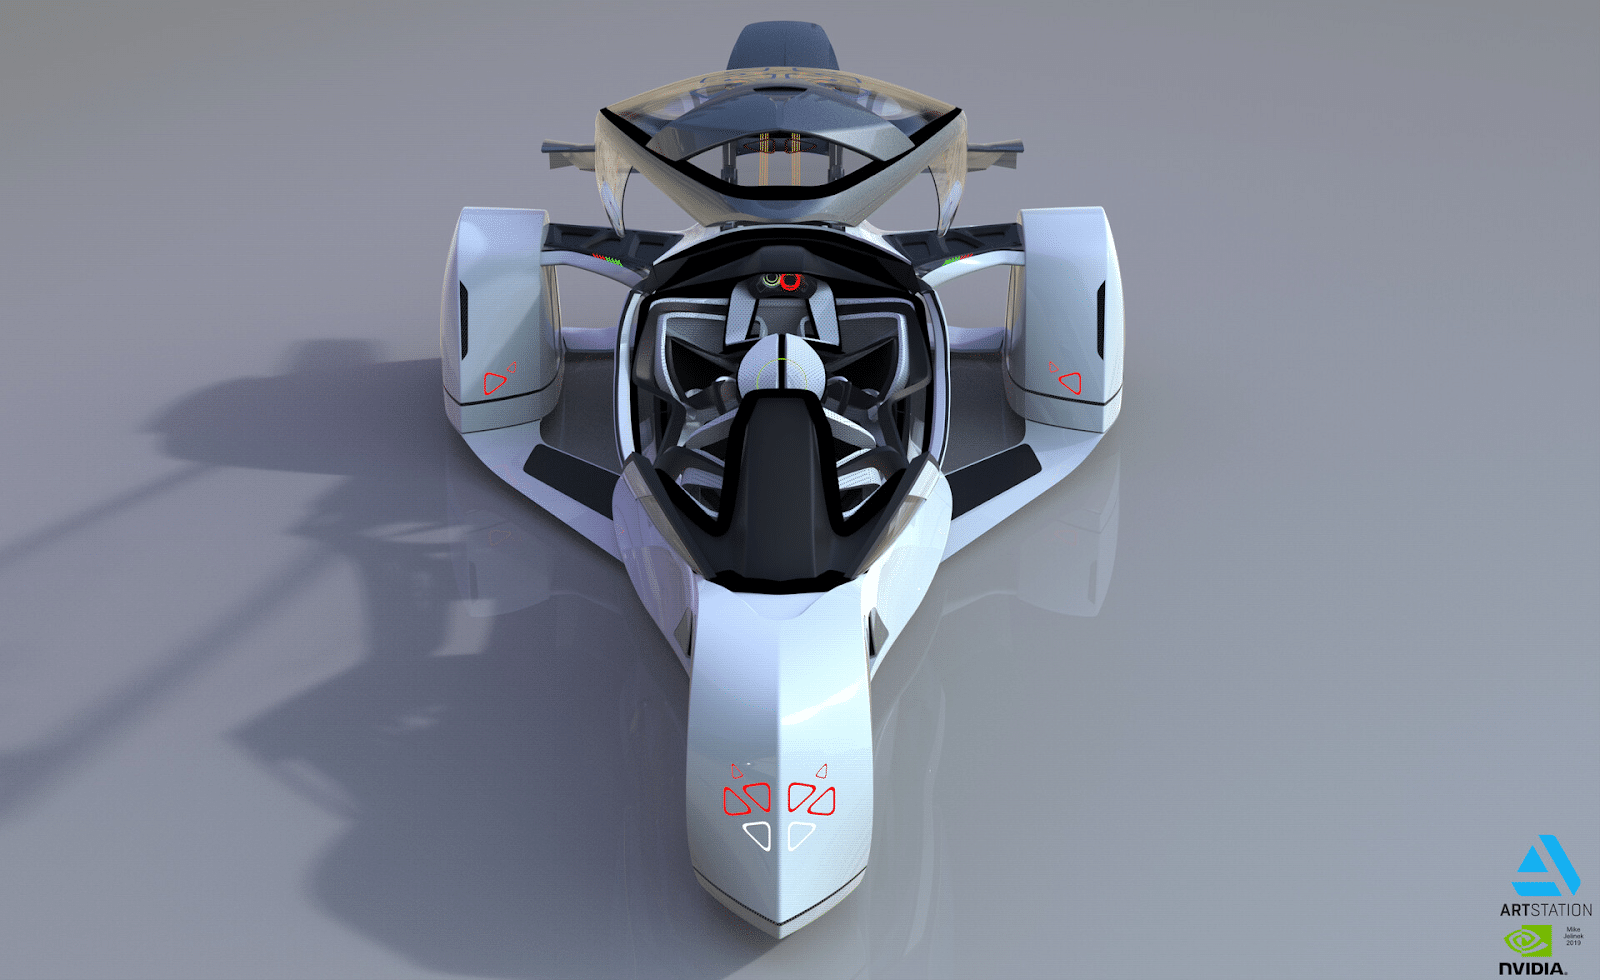 Artwork of car by Mike Jelinek designed in Gravity Sketch